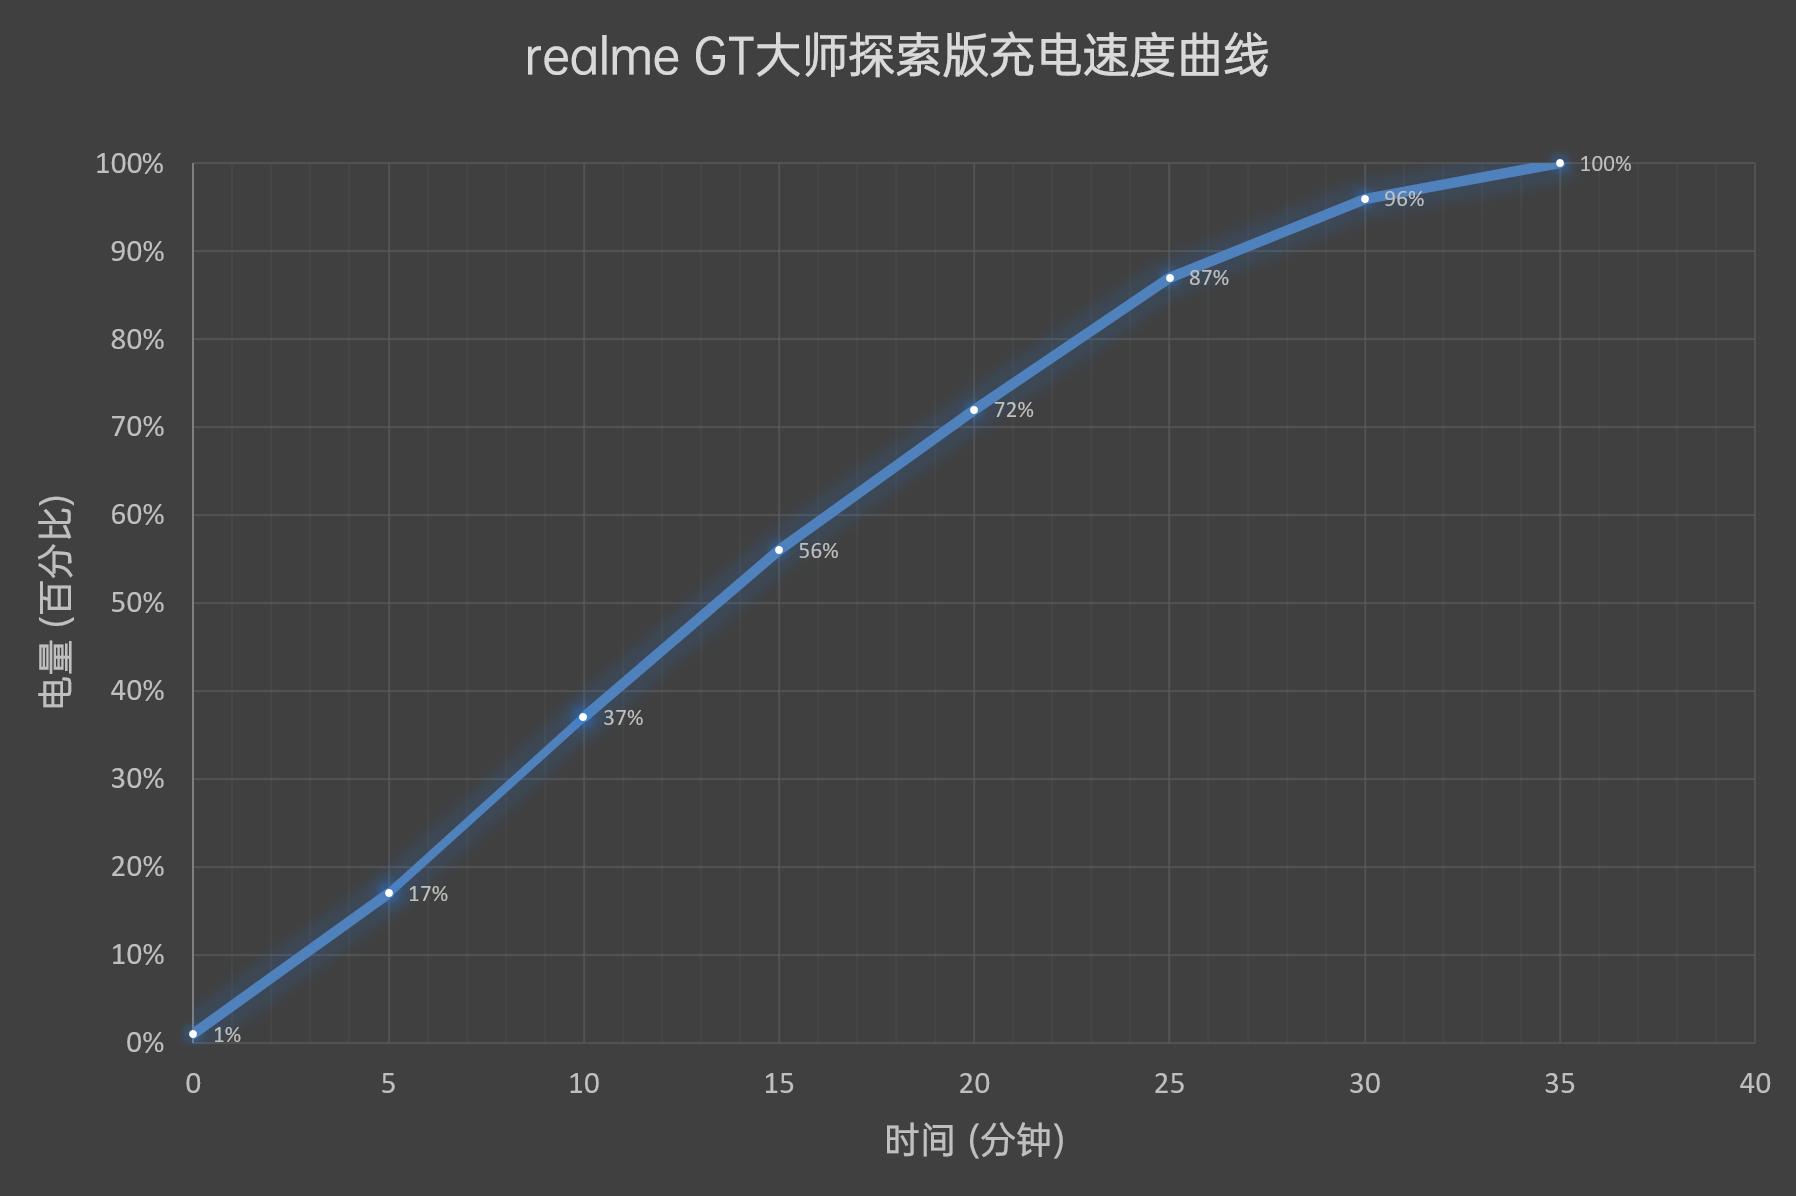 realme GT大师探索版评测:质感/颜值都有了